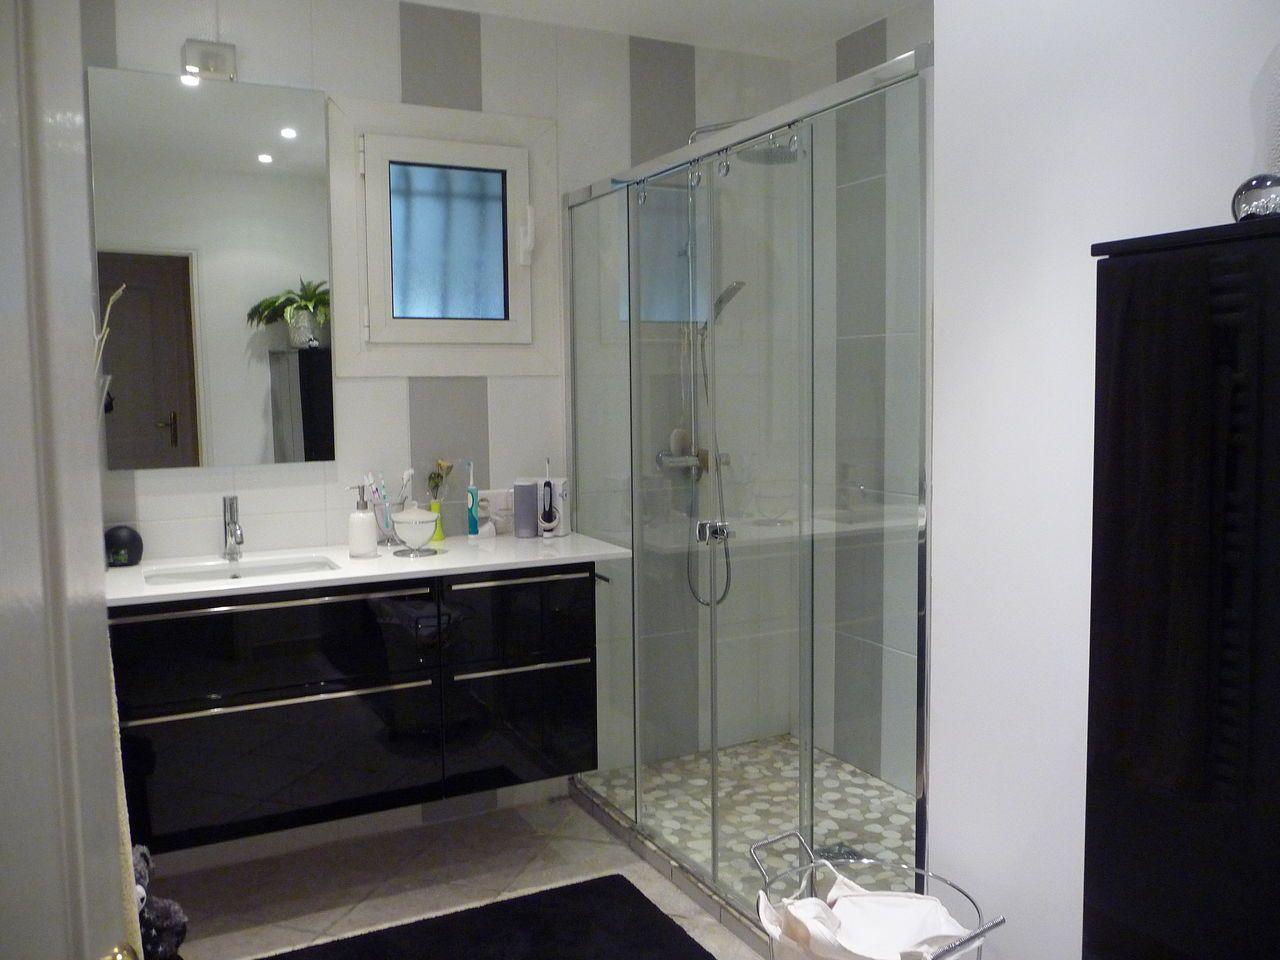 Douchealitaliennereferencejpg Bathroom Italian - Amenagement de salle de bain avec douche